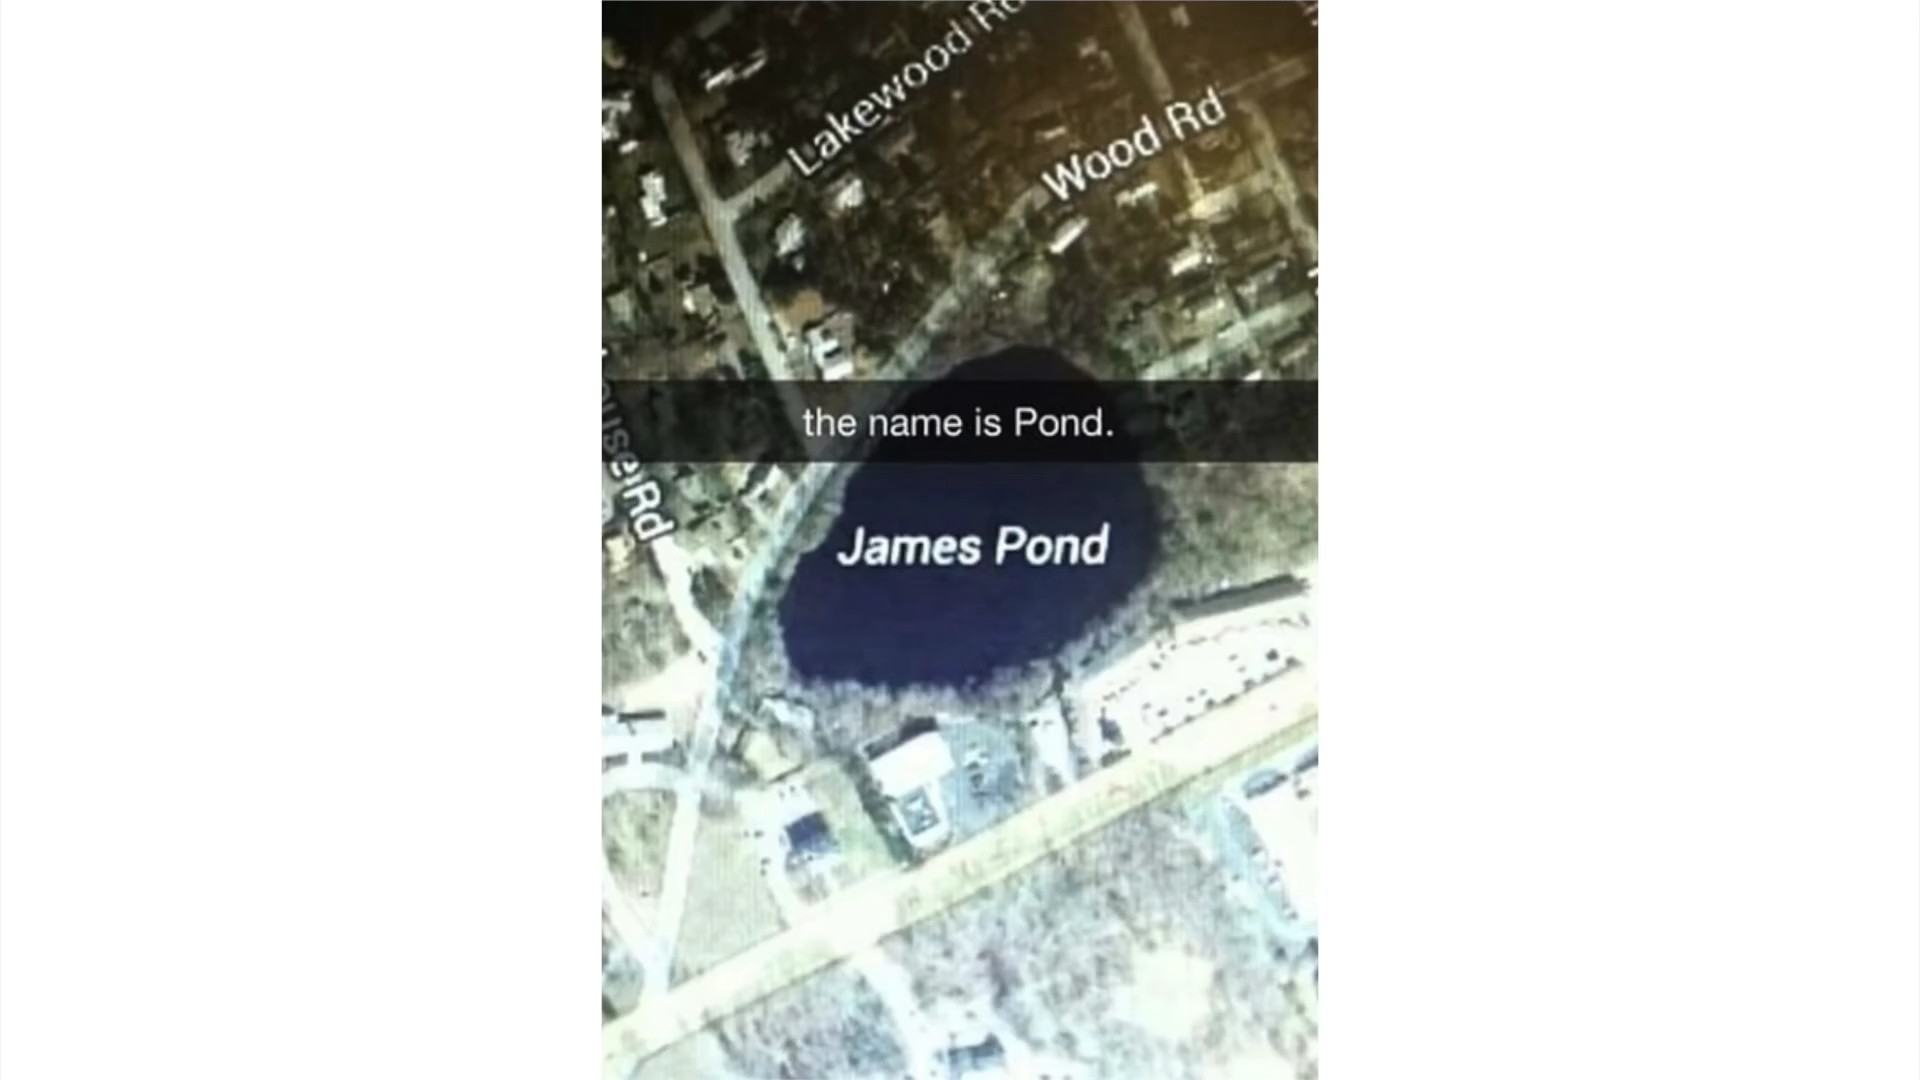 James pond - meme